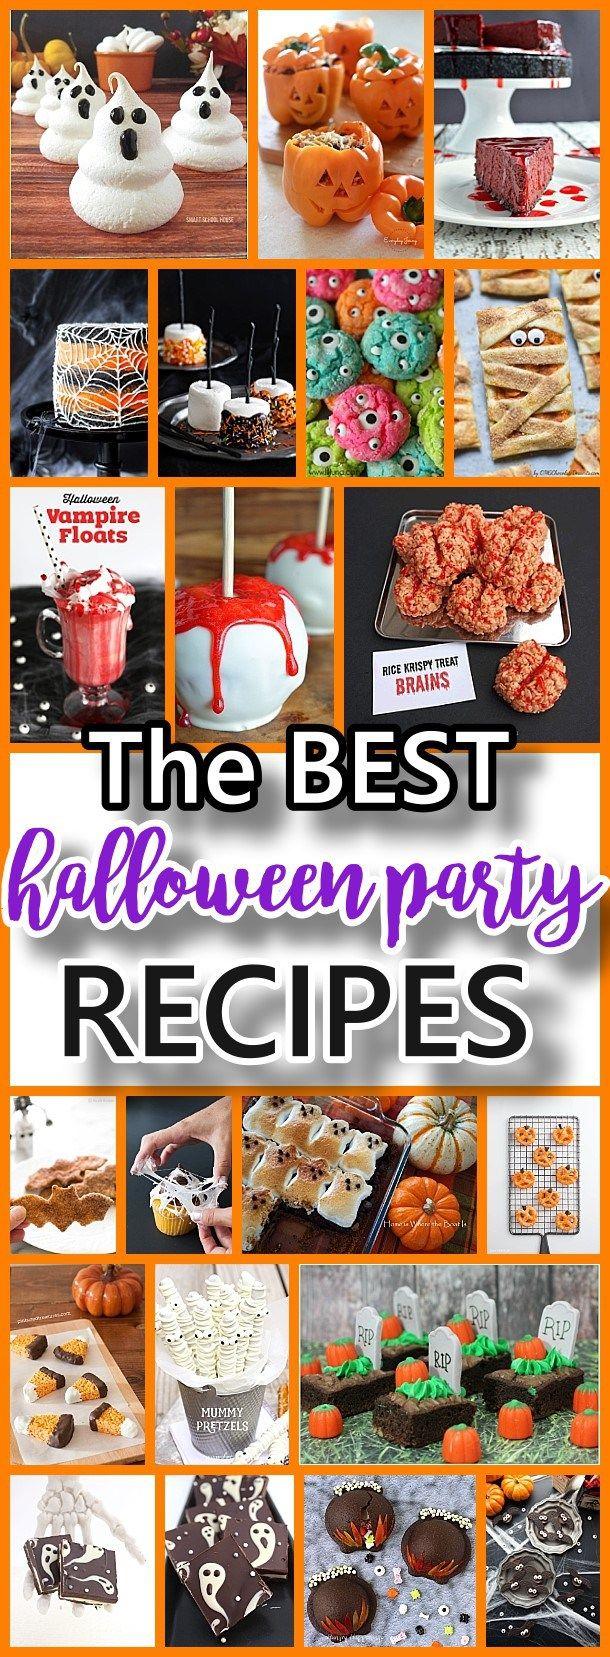 Best 10+ Halloween party recipes ideas on Pinterest | Kids ...